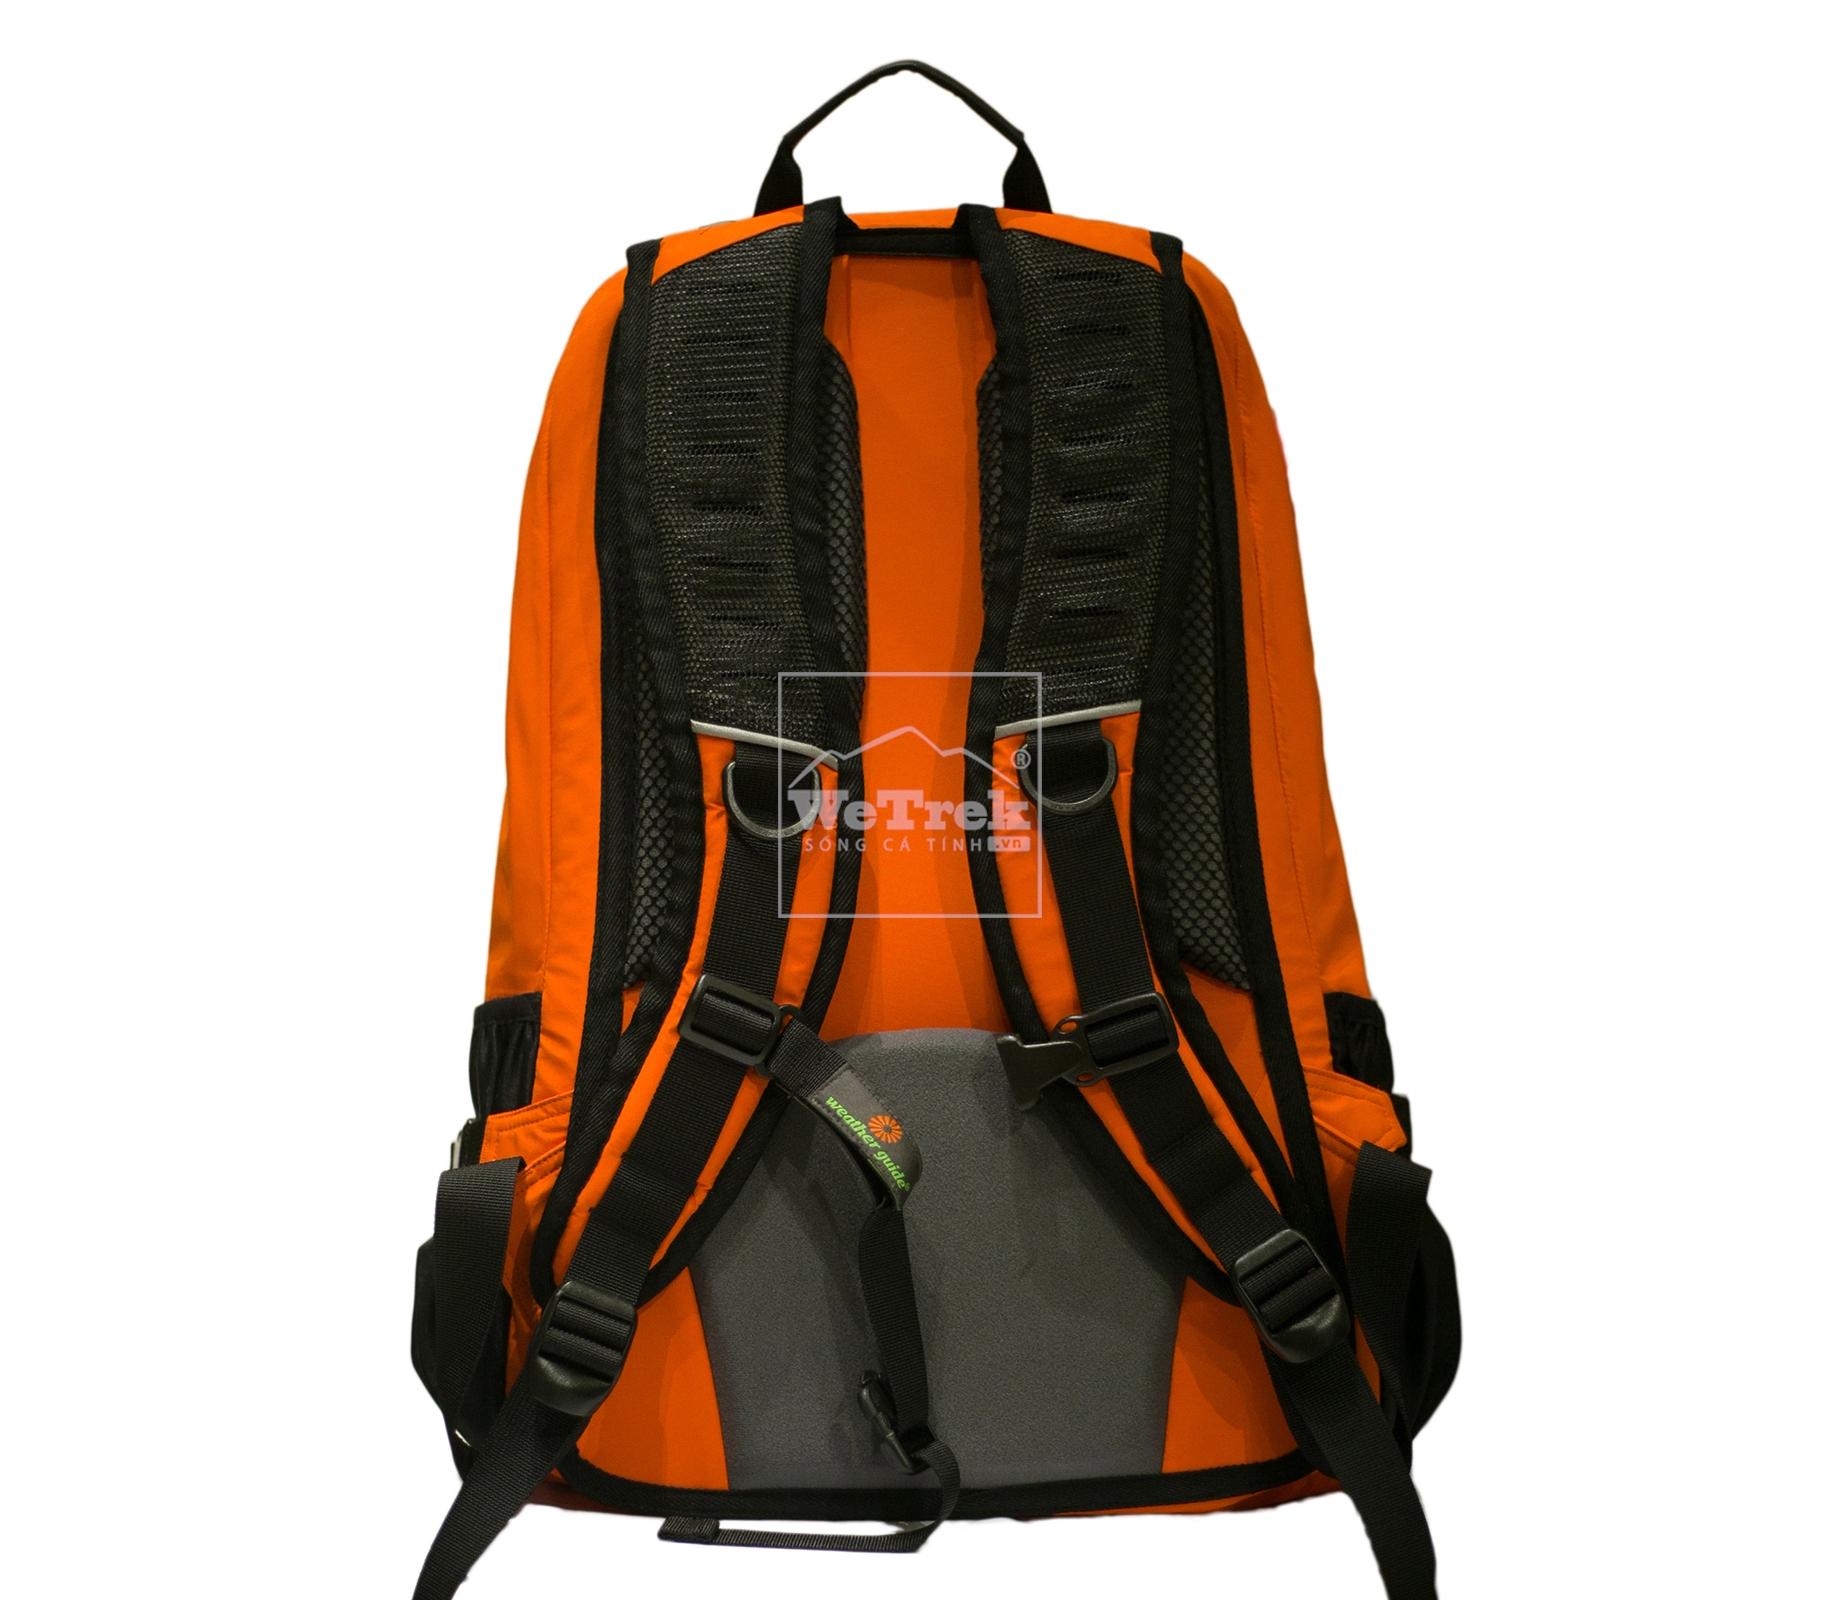 5-balo-du-lich-chong-nuoc-Weather-Guide-Waterproof-Backpack-CA-0108-8306-wetrekvn.jpg